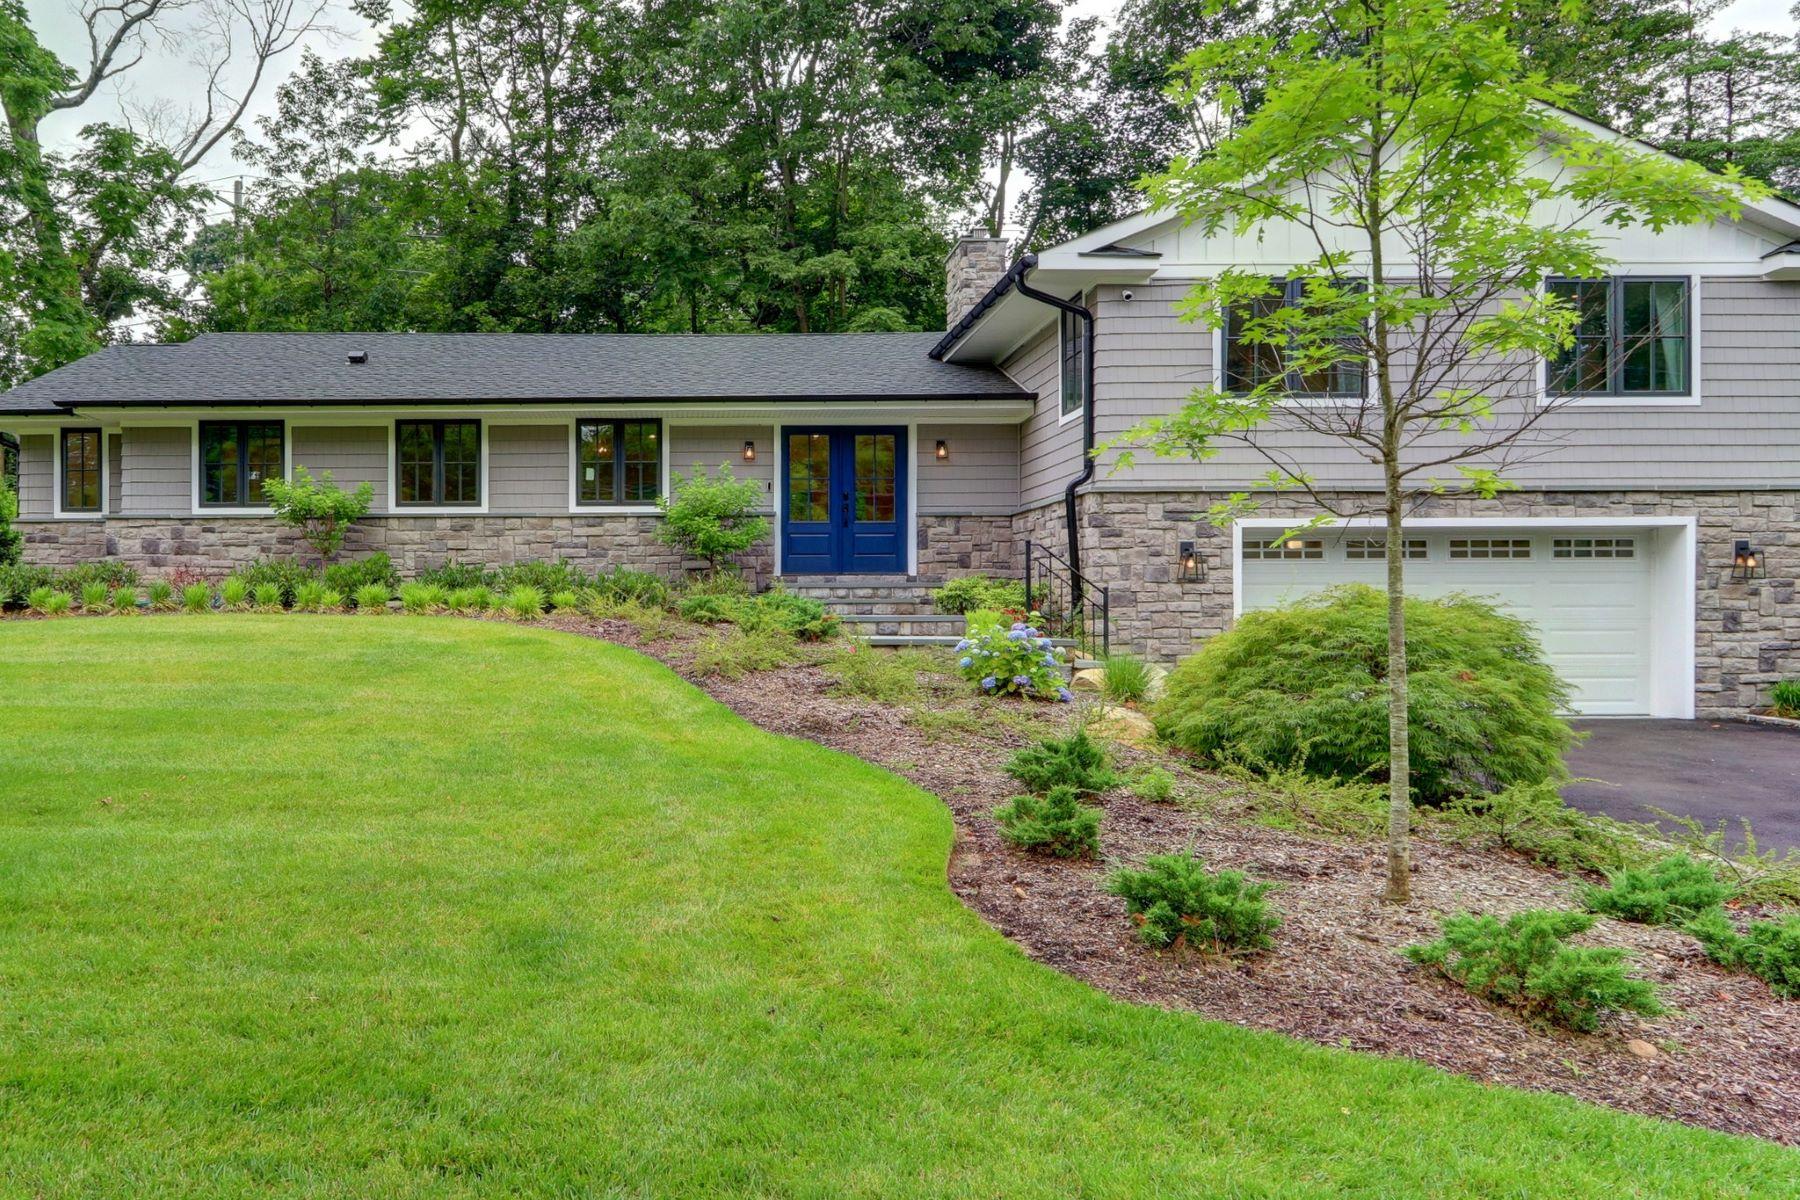 Single Family Homes for Active at Roslyn Estates 10 The Hemlocks Roslyn Estates, New York 11576 United States